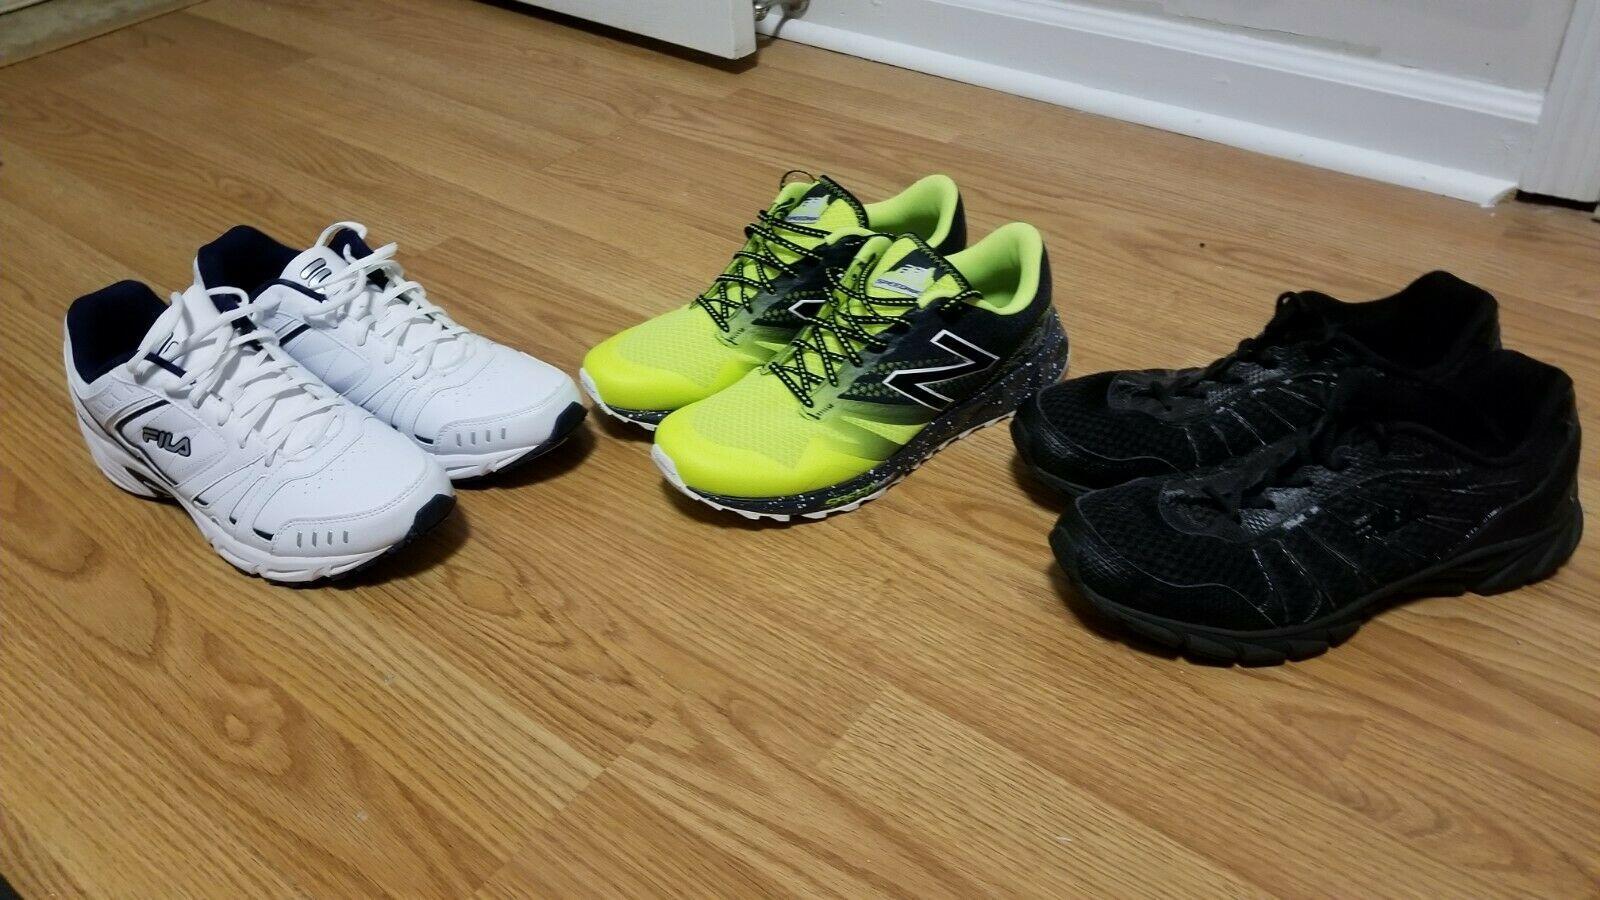 meet 03db2 0fe96 Details about ASICS GEL-Kayano 23 Running Shoes Men's Size ...